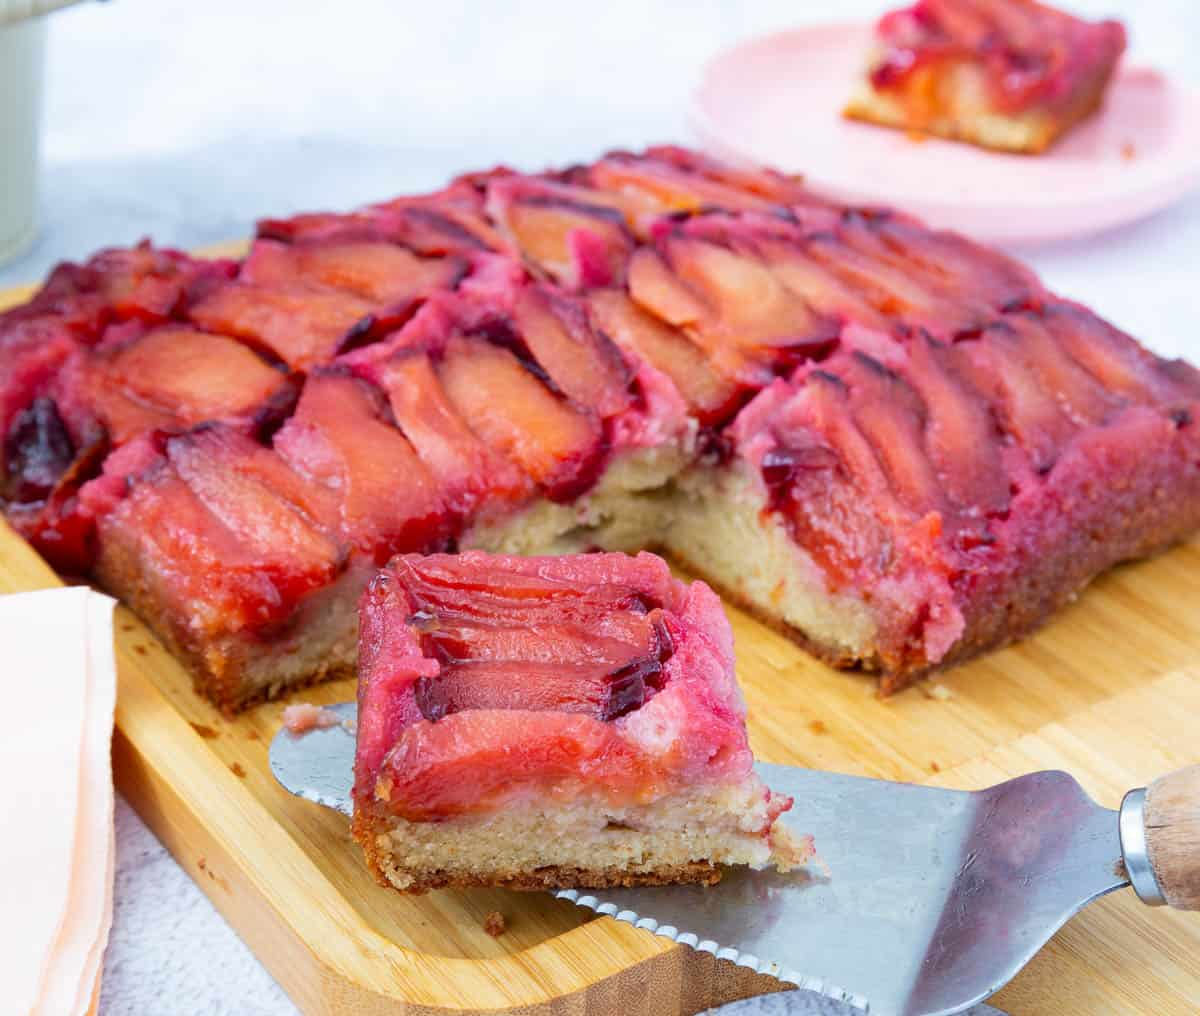 Slice of plum cake on a cake board.